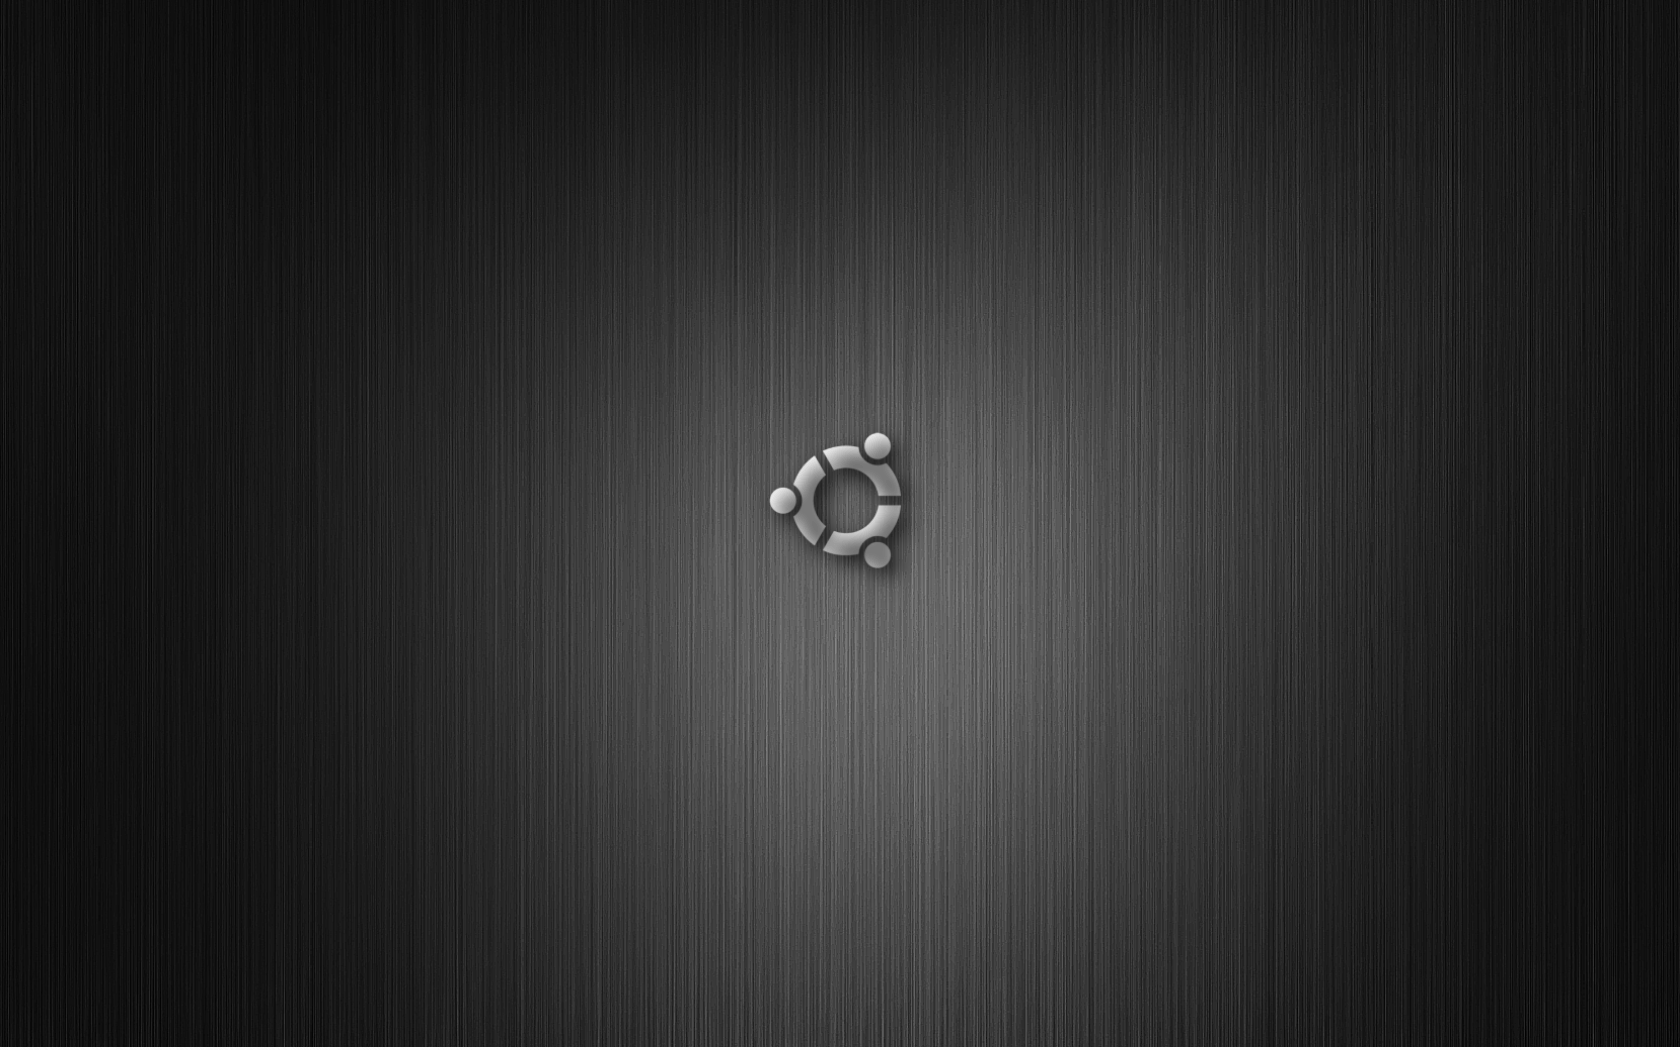 ubuntu wallpaper linux morzze - photo #13